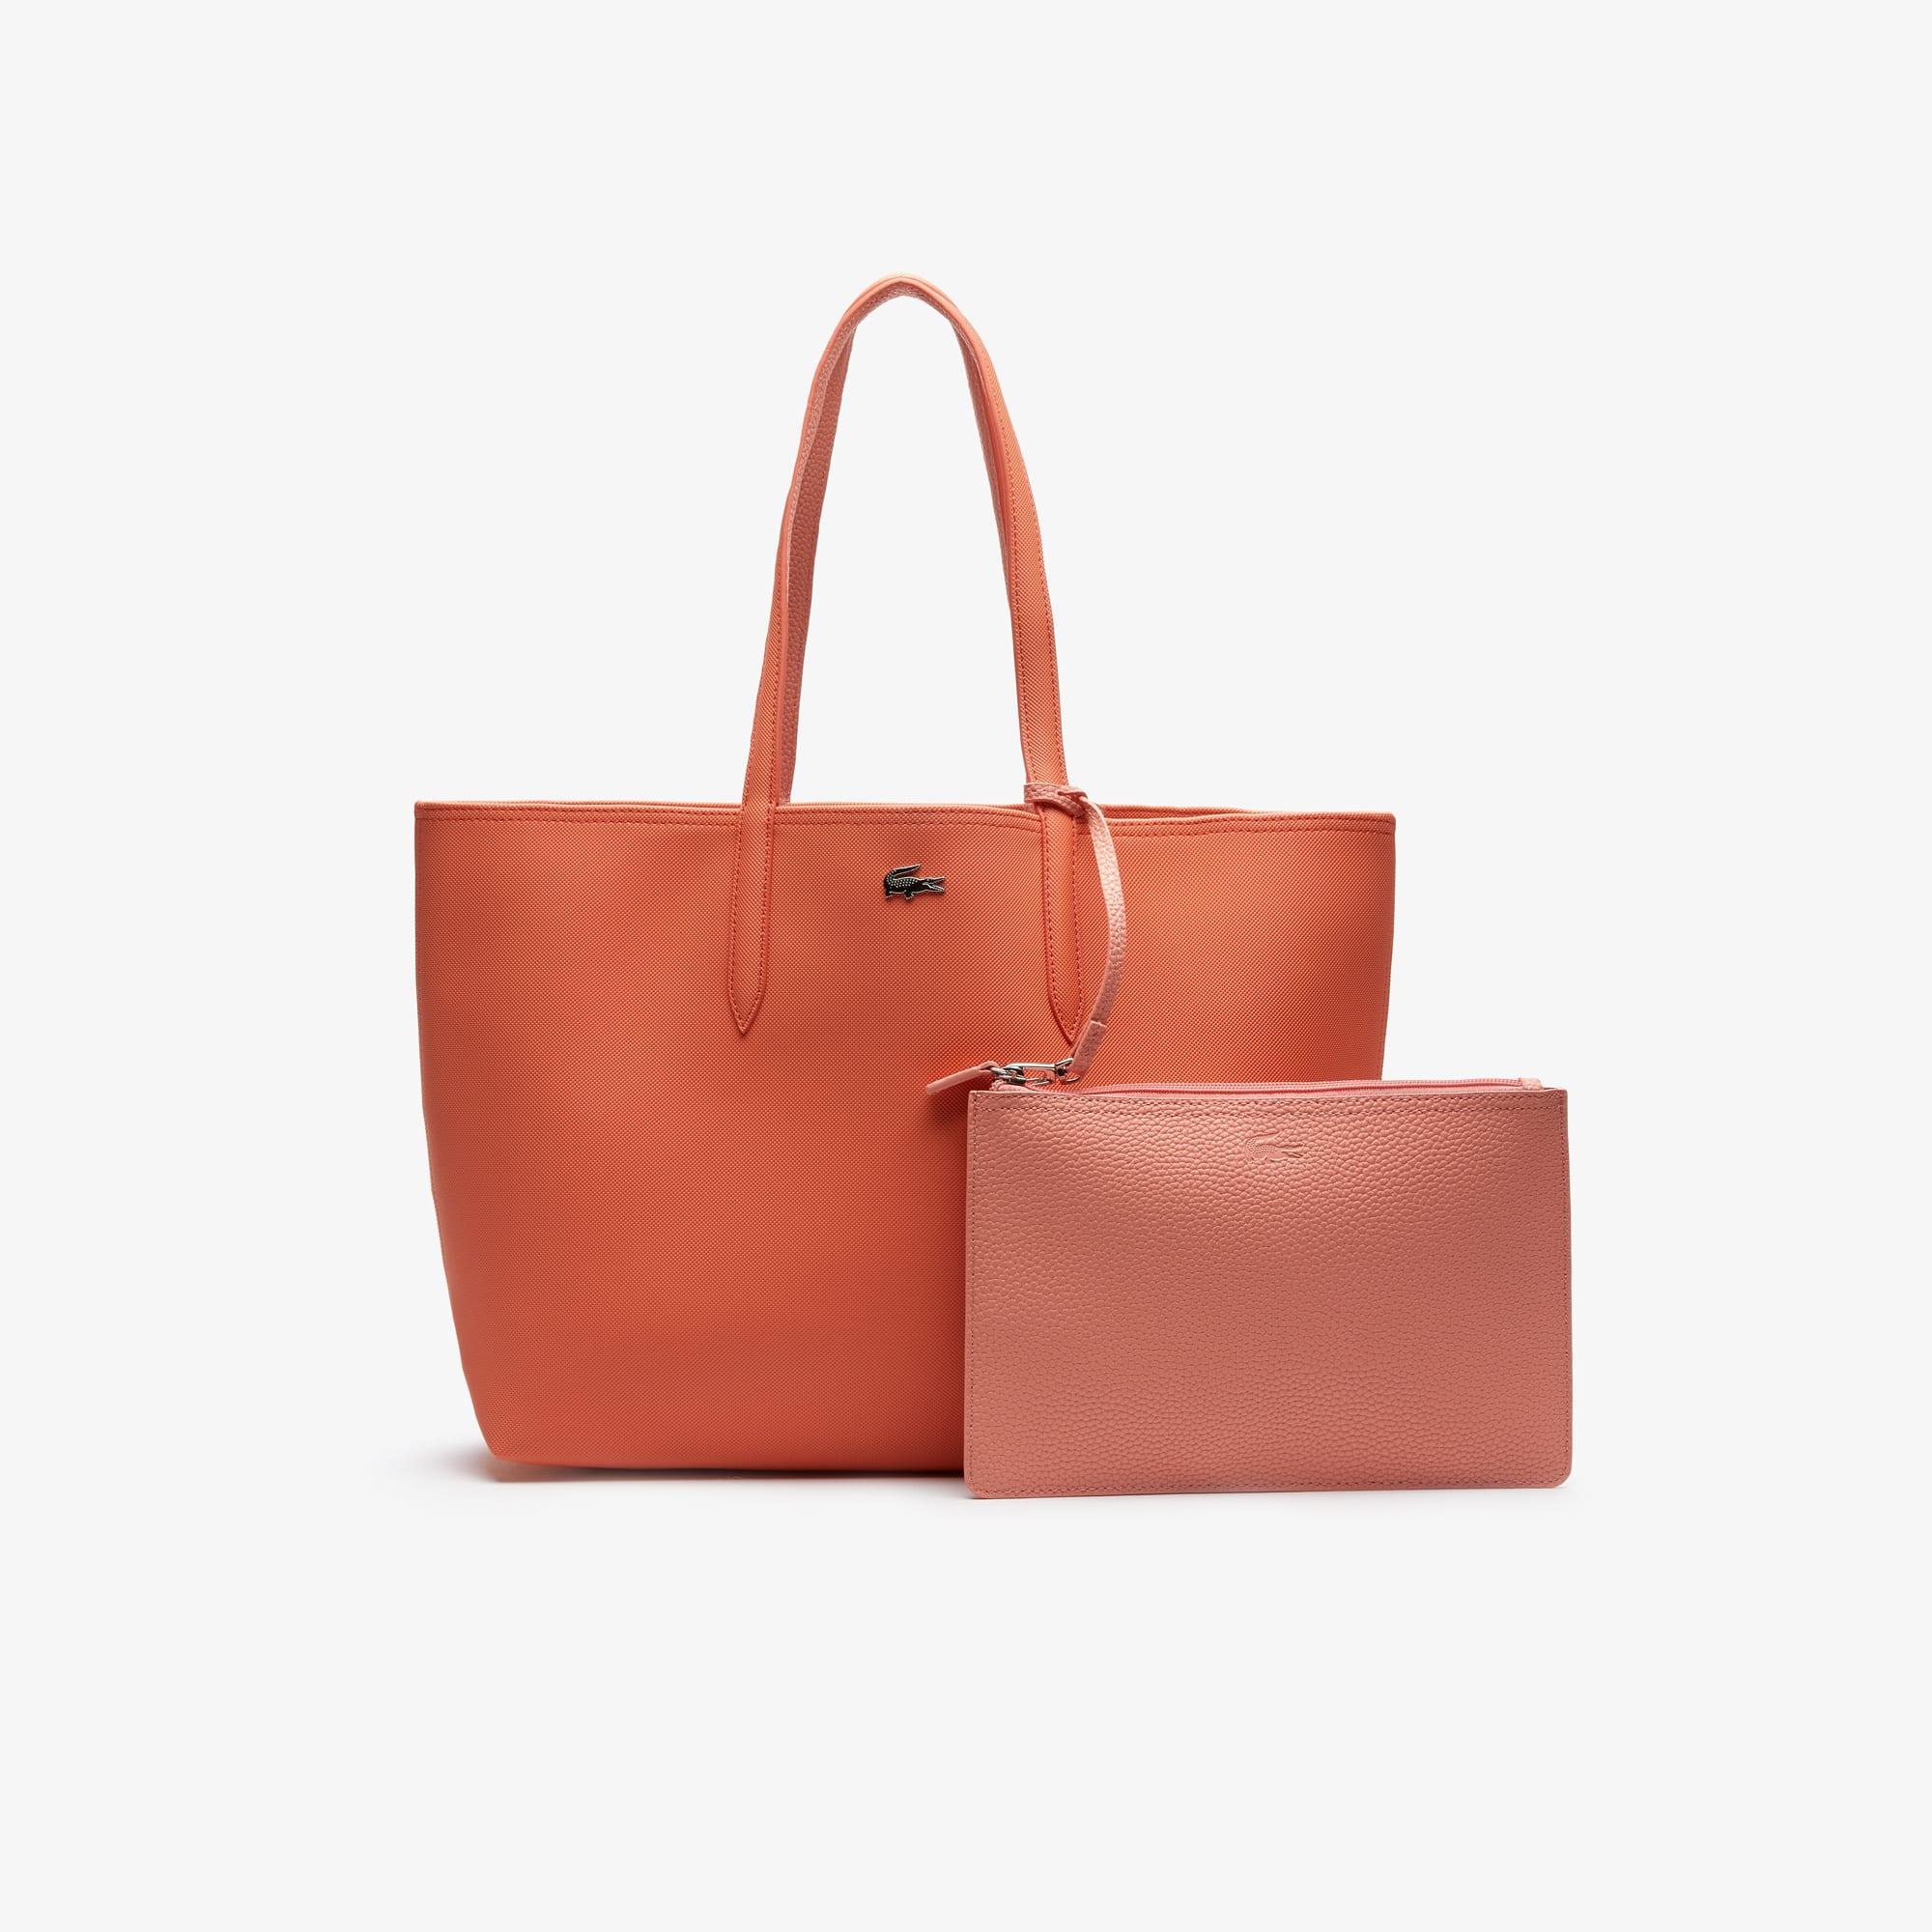 Women s Anna Reversible Bicolour Tote Bag. £110.00. + 4 colors. Monogram it a7ac9a237f8e1